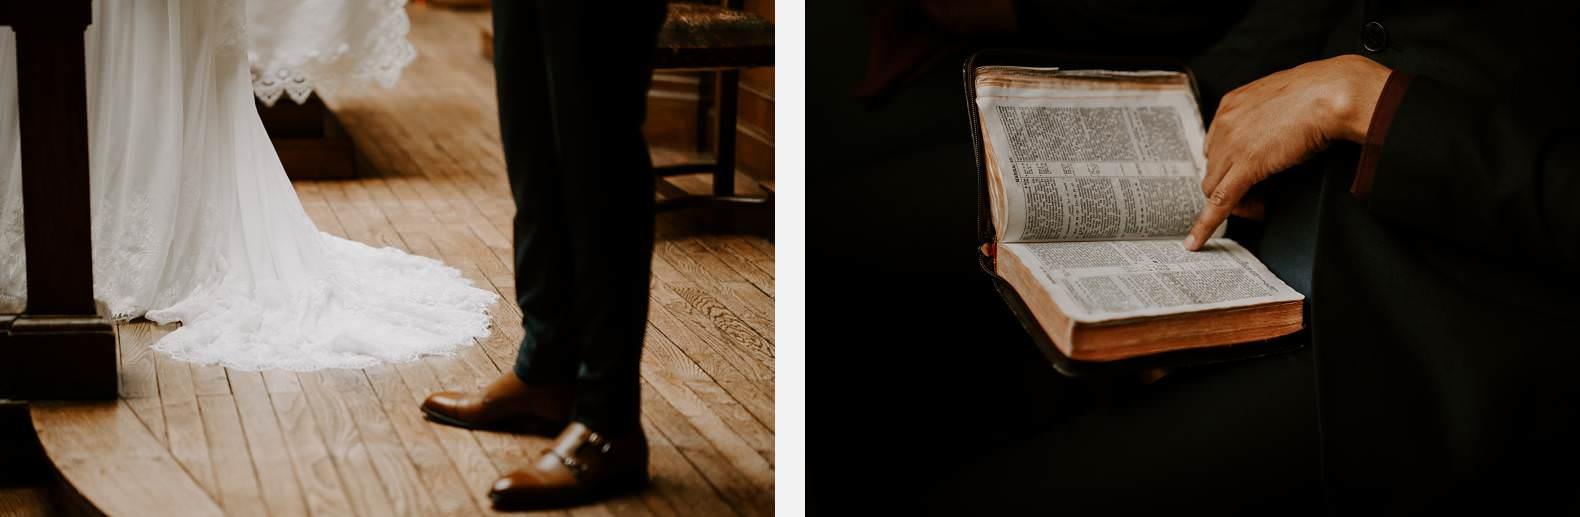 mariage manoir de corny photographe bel esprit 0022 1